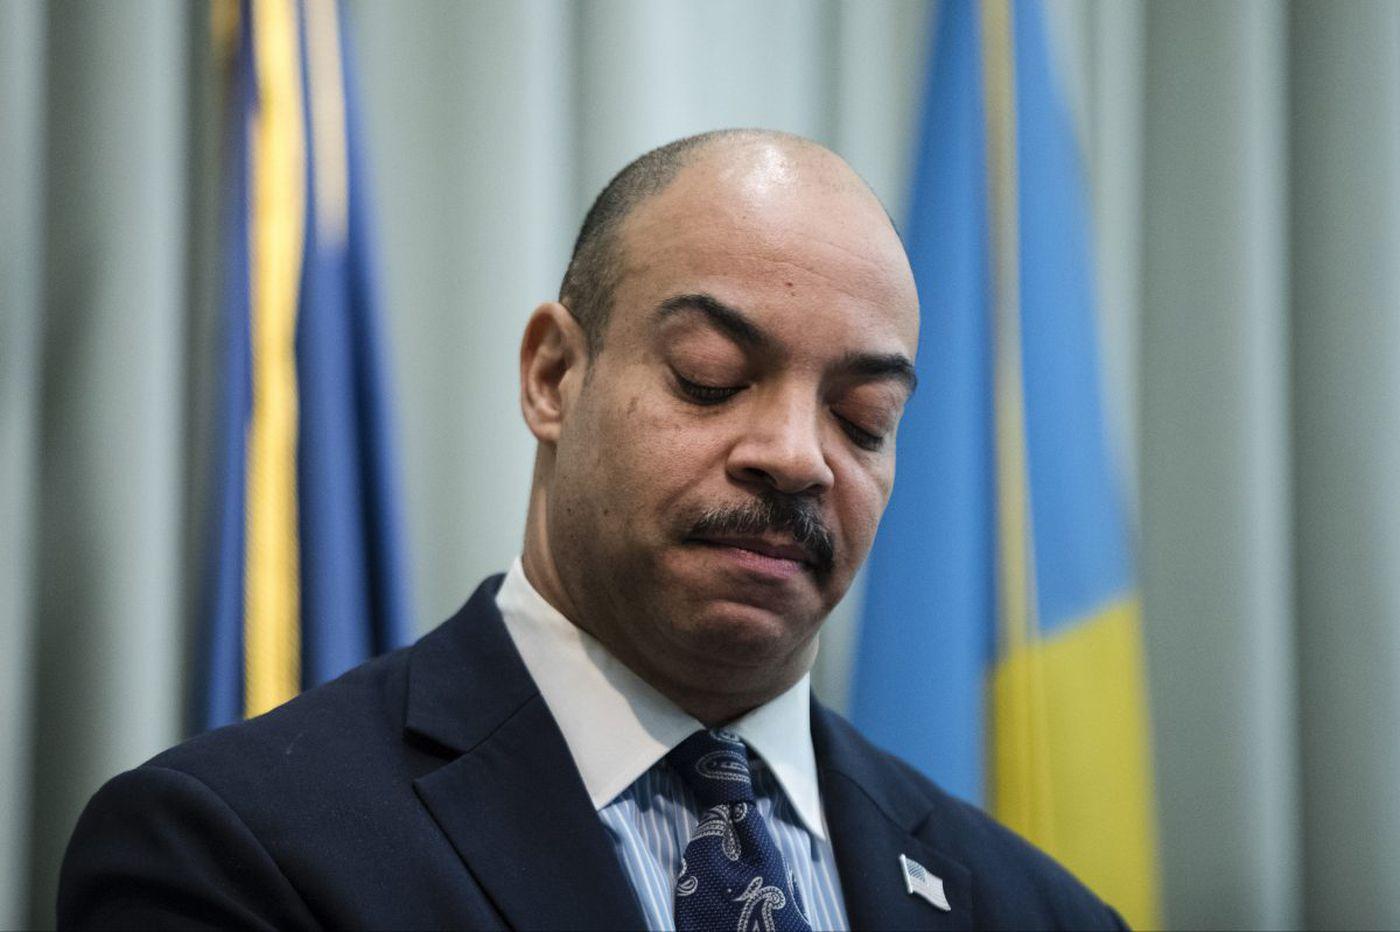 Prosecutors gain evidence ruling against Philly DA Seth Williams